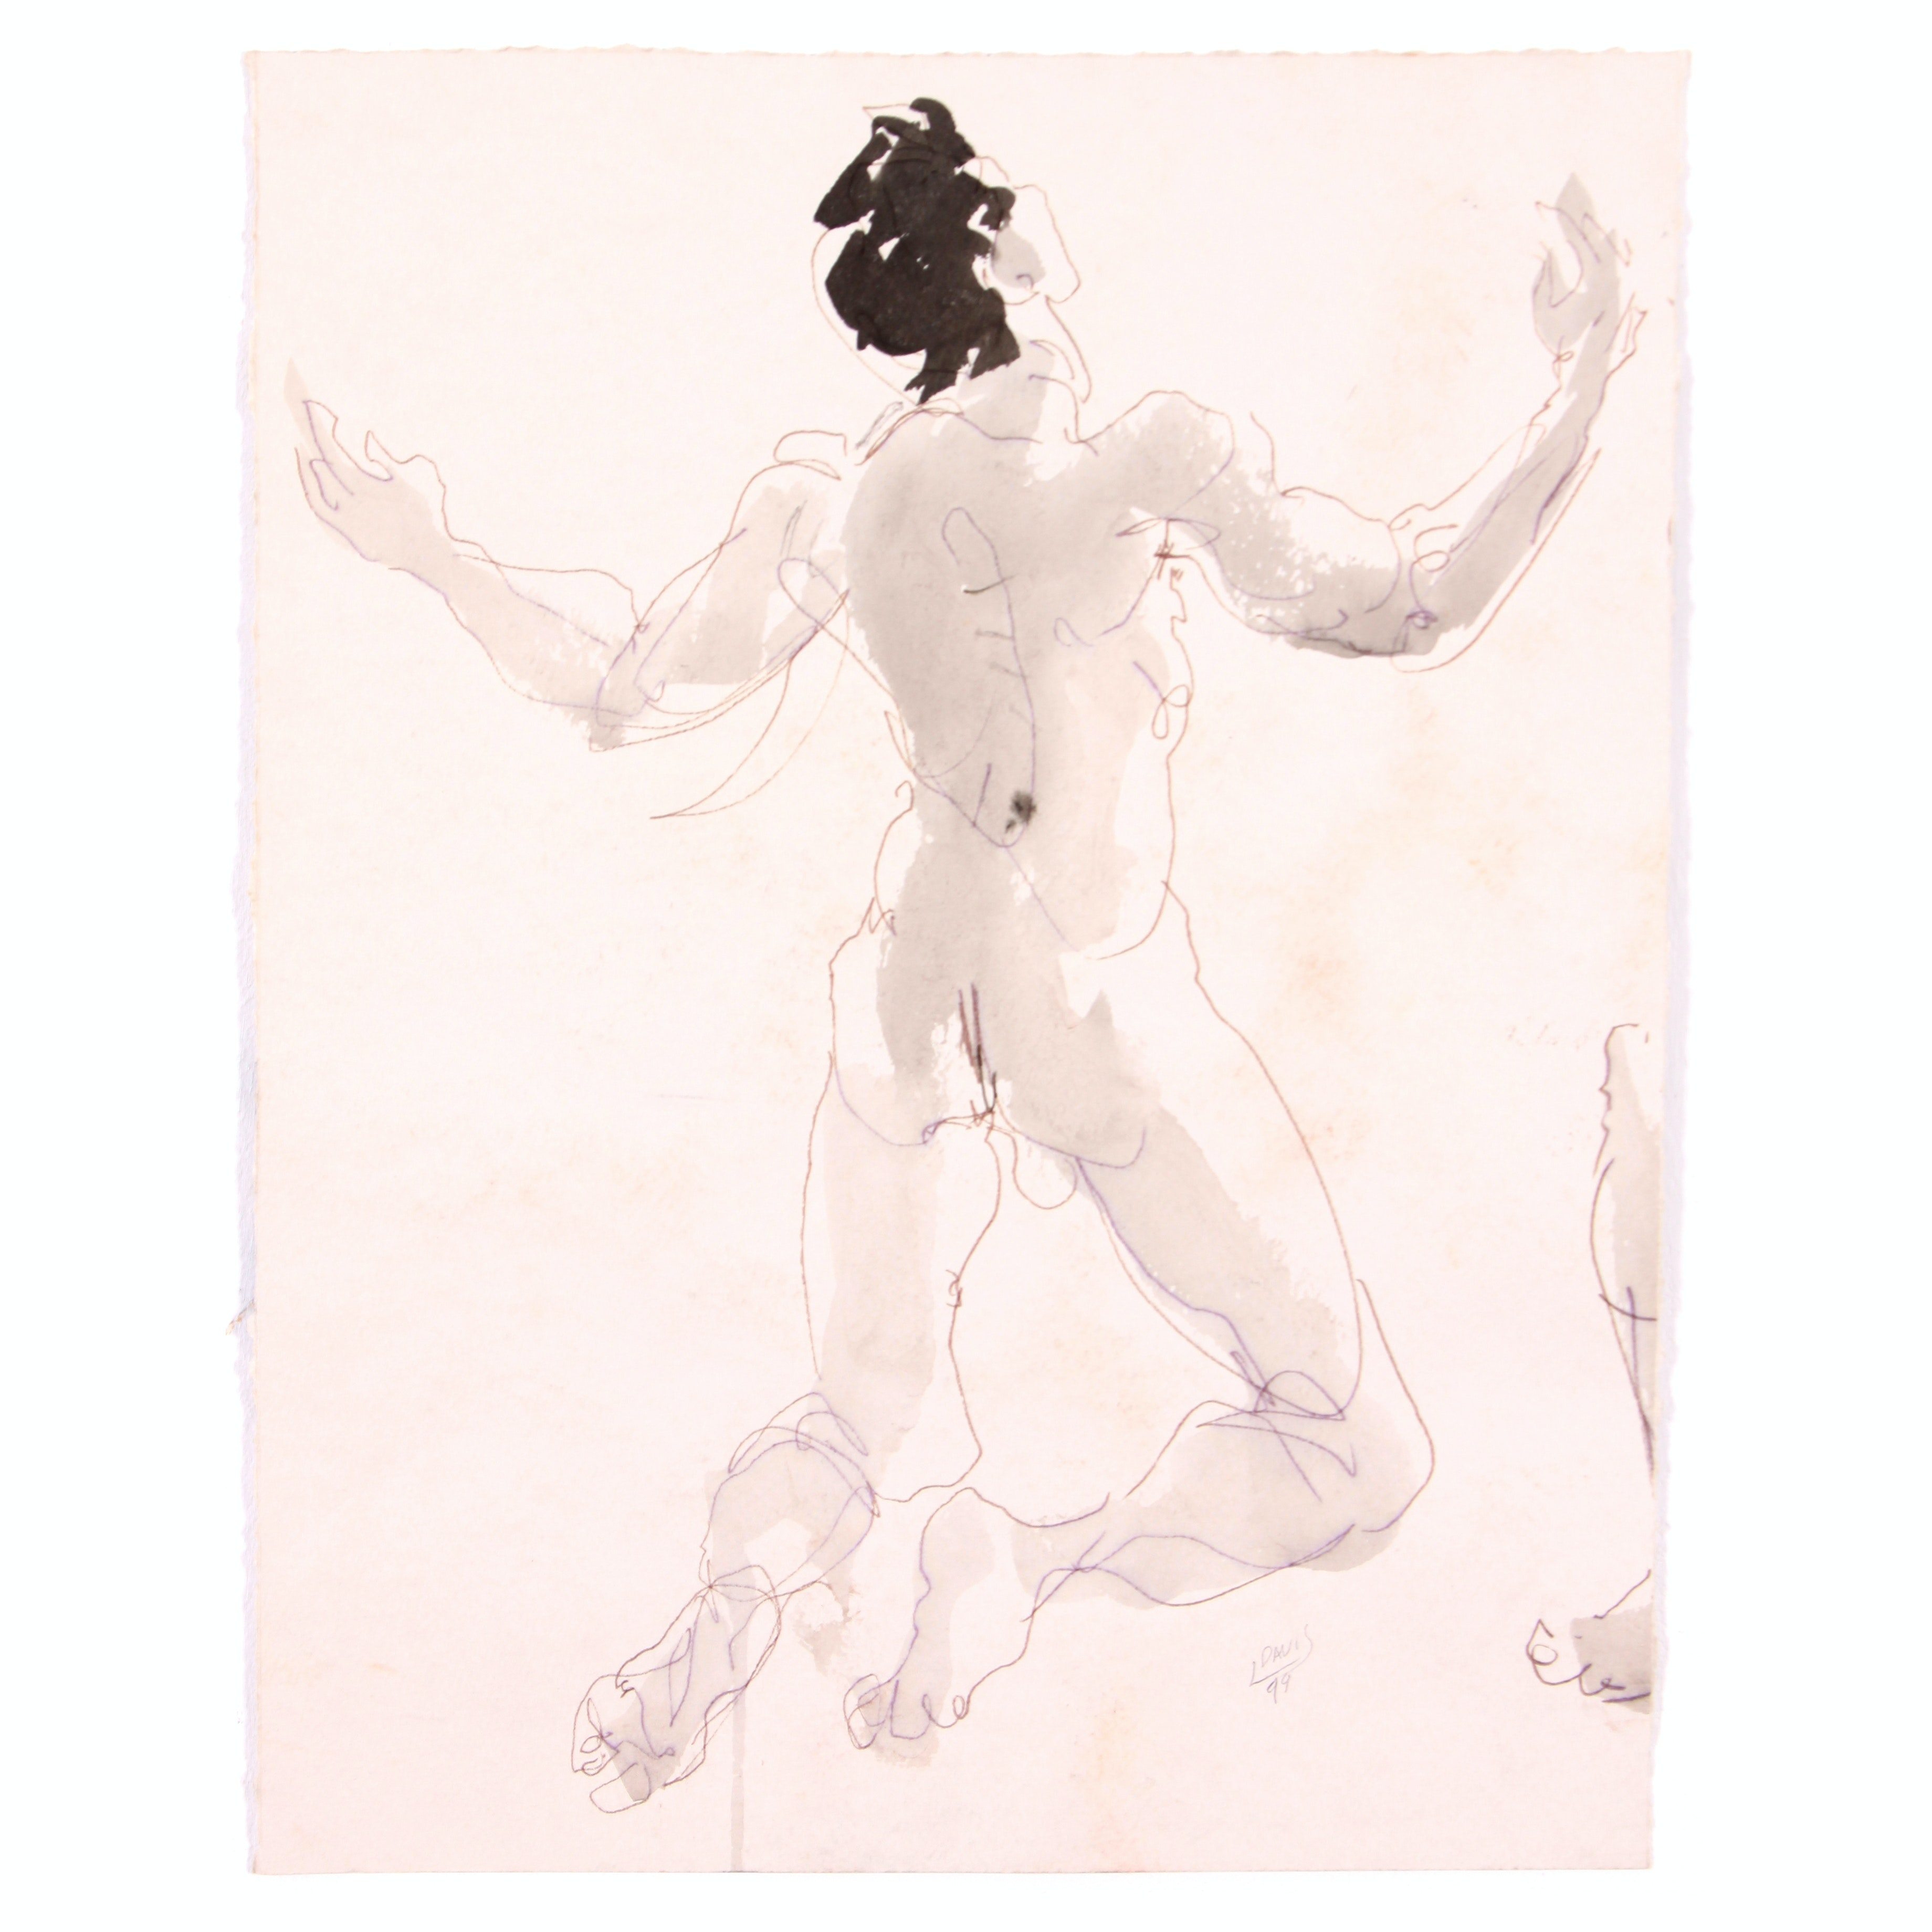 Original Nude Male Figure Study in Watercolor by Lois Davis